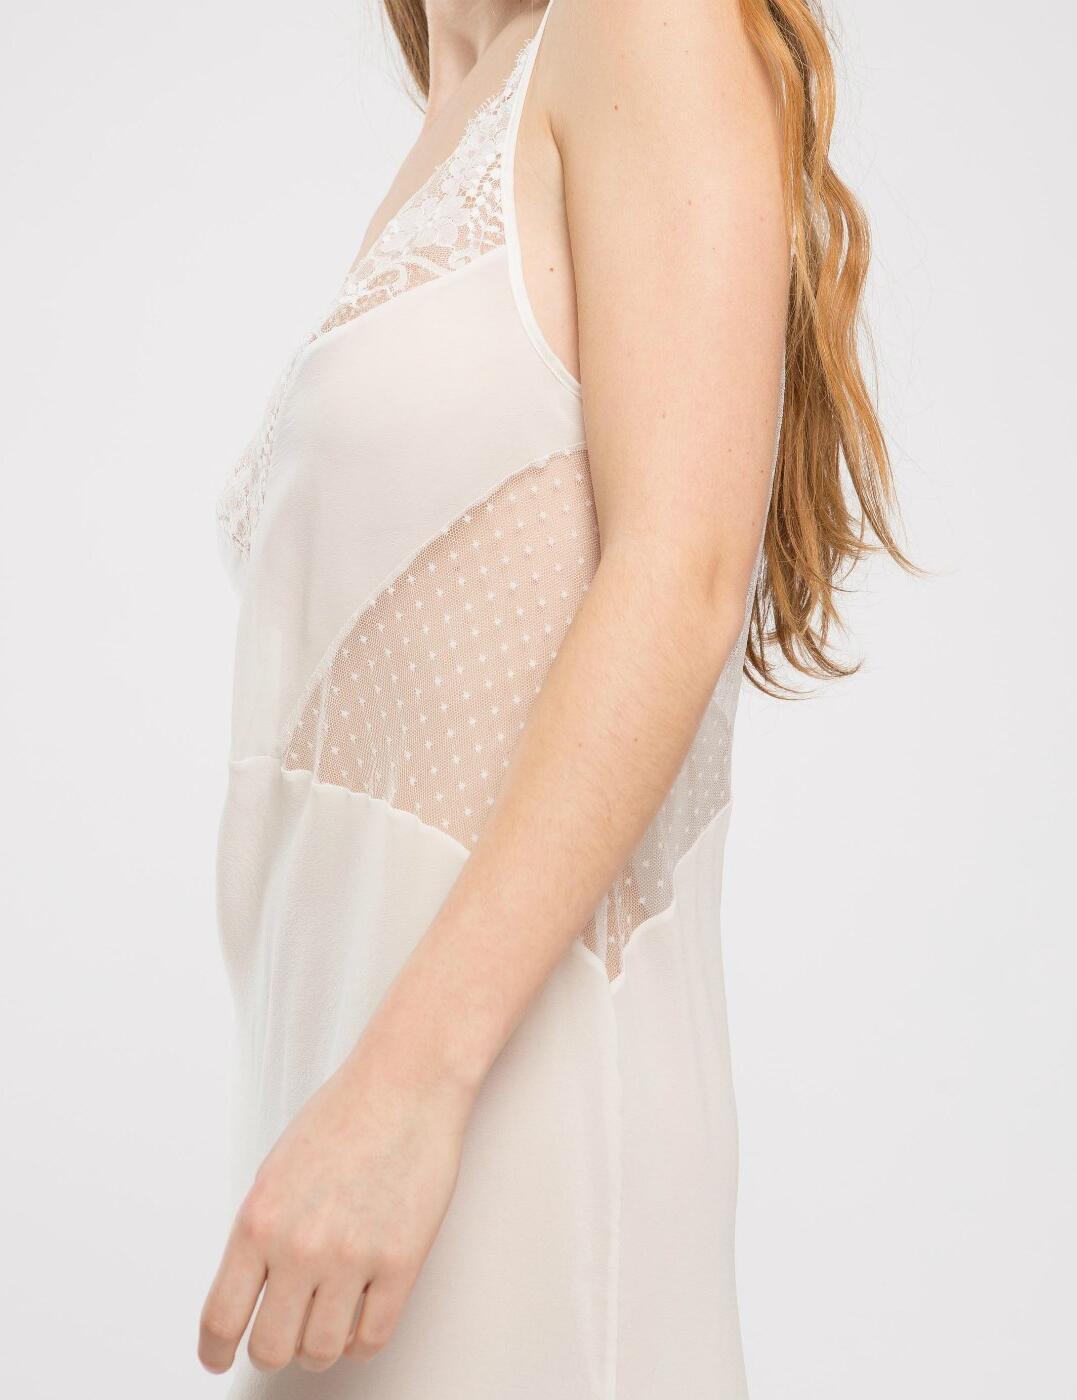 Maison Lejaby Oui Lejaby Slip Chemise Nightdress 17574 Luxury Womens Lingerie